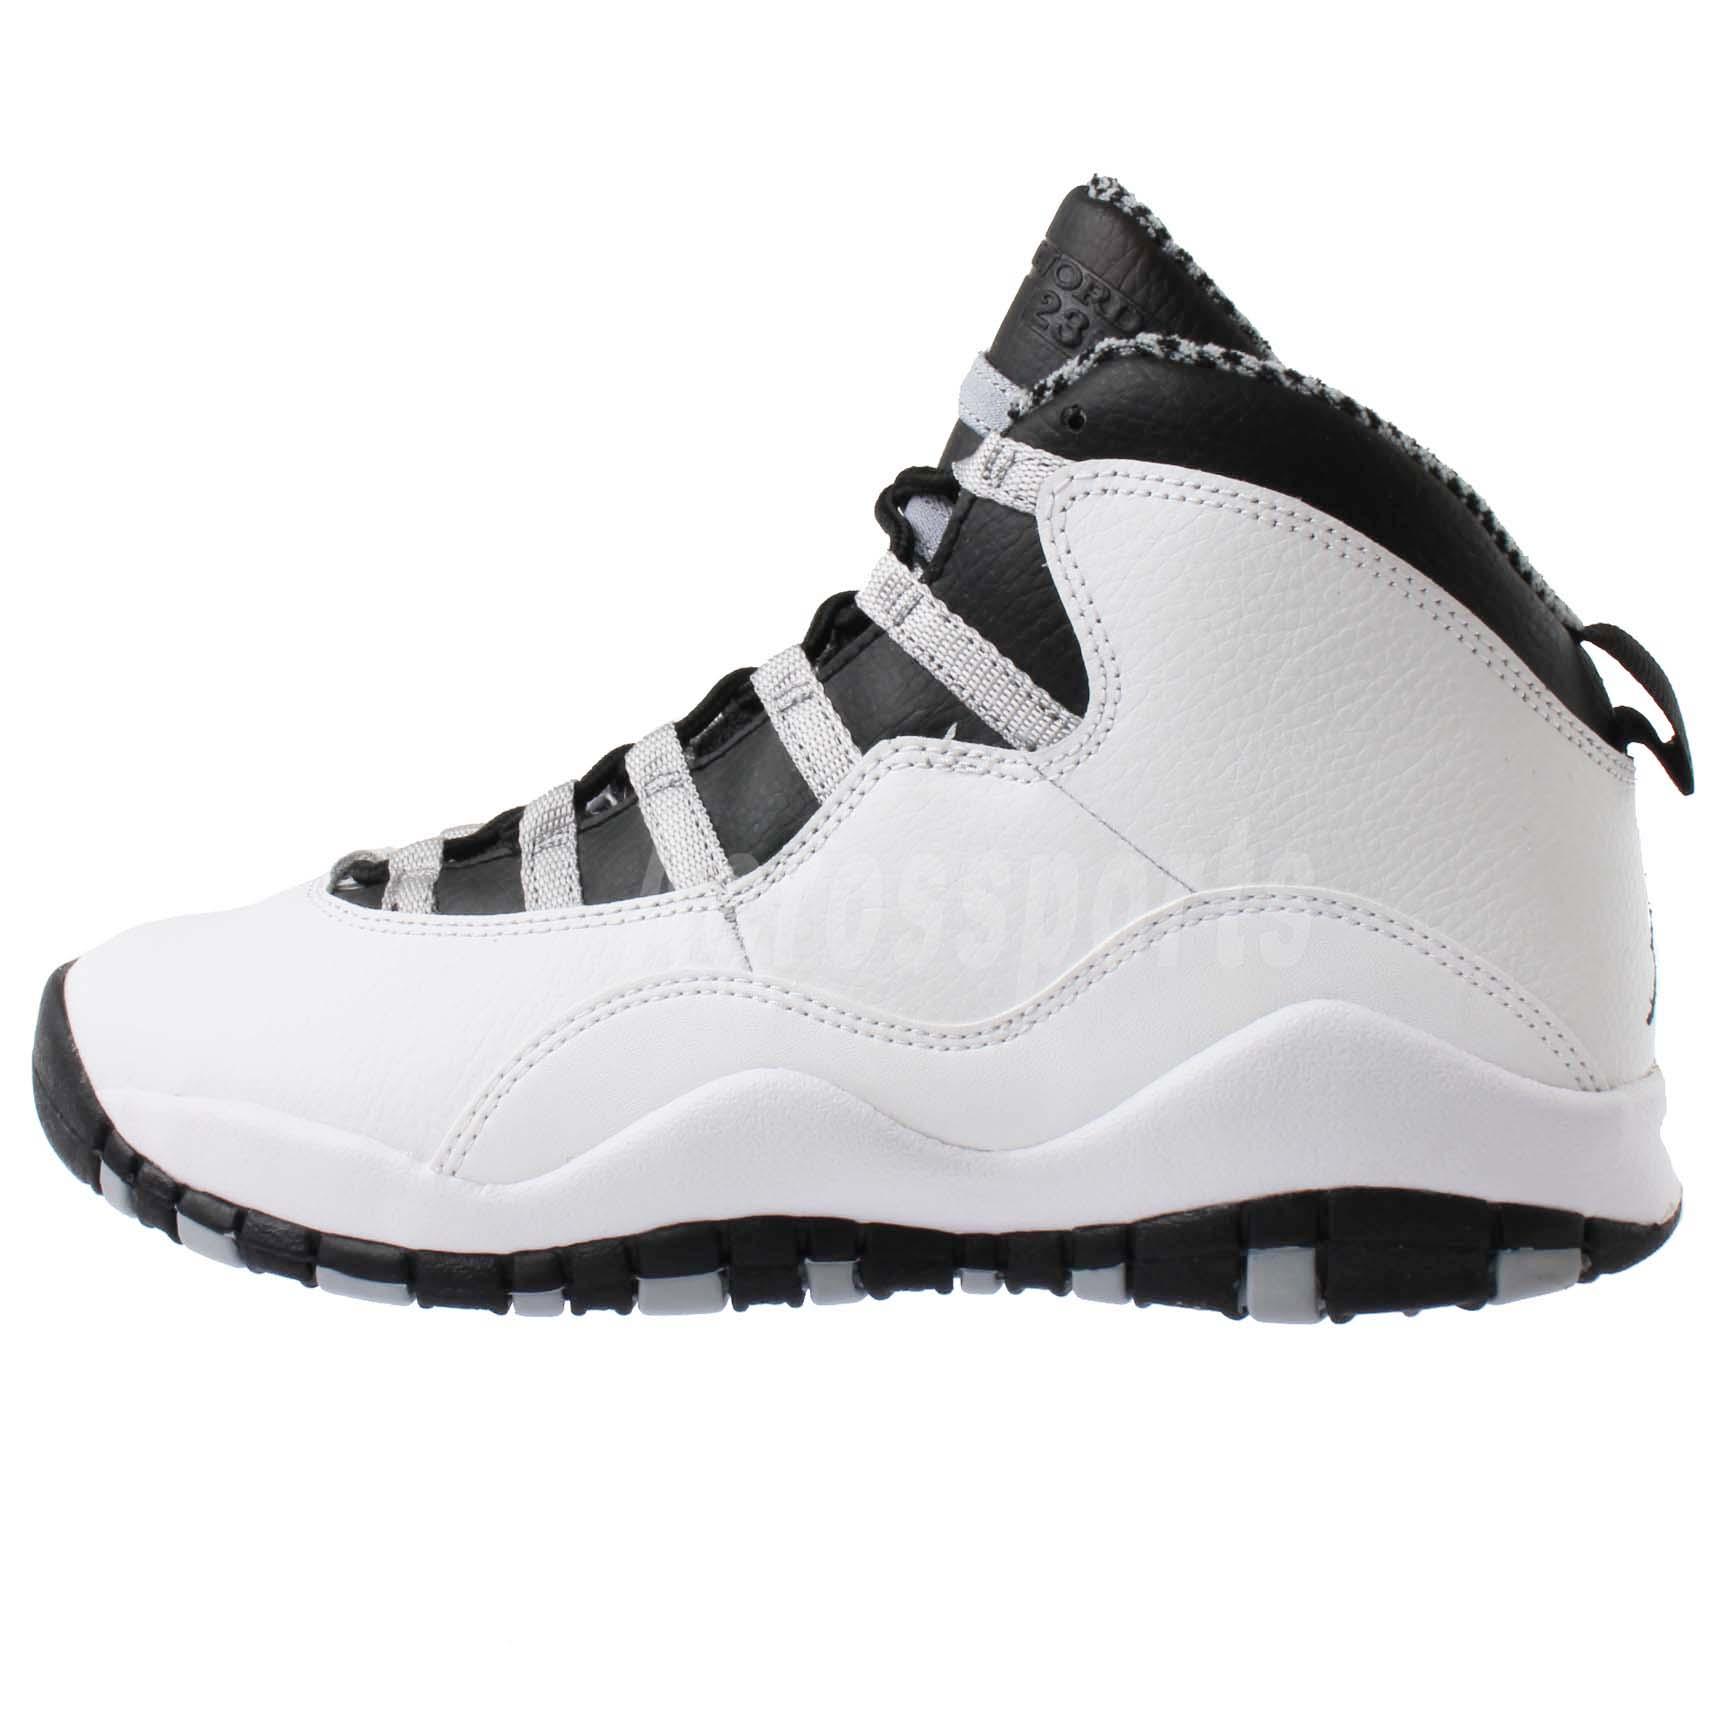 "Nike Air Jordan 10 Retro GS X "" Steel "" Kids Girls Youth ..."